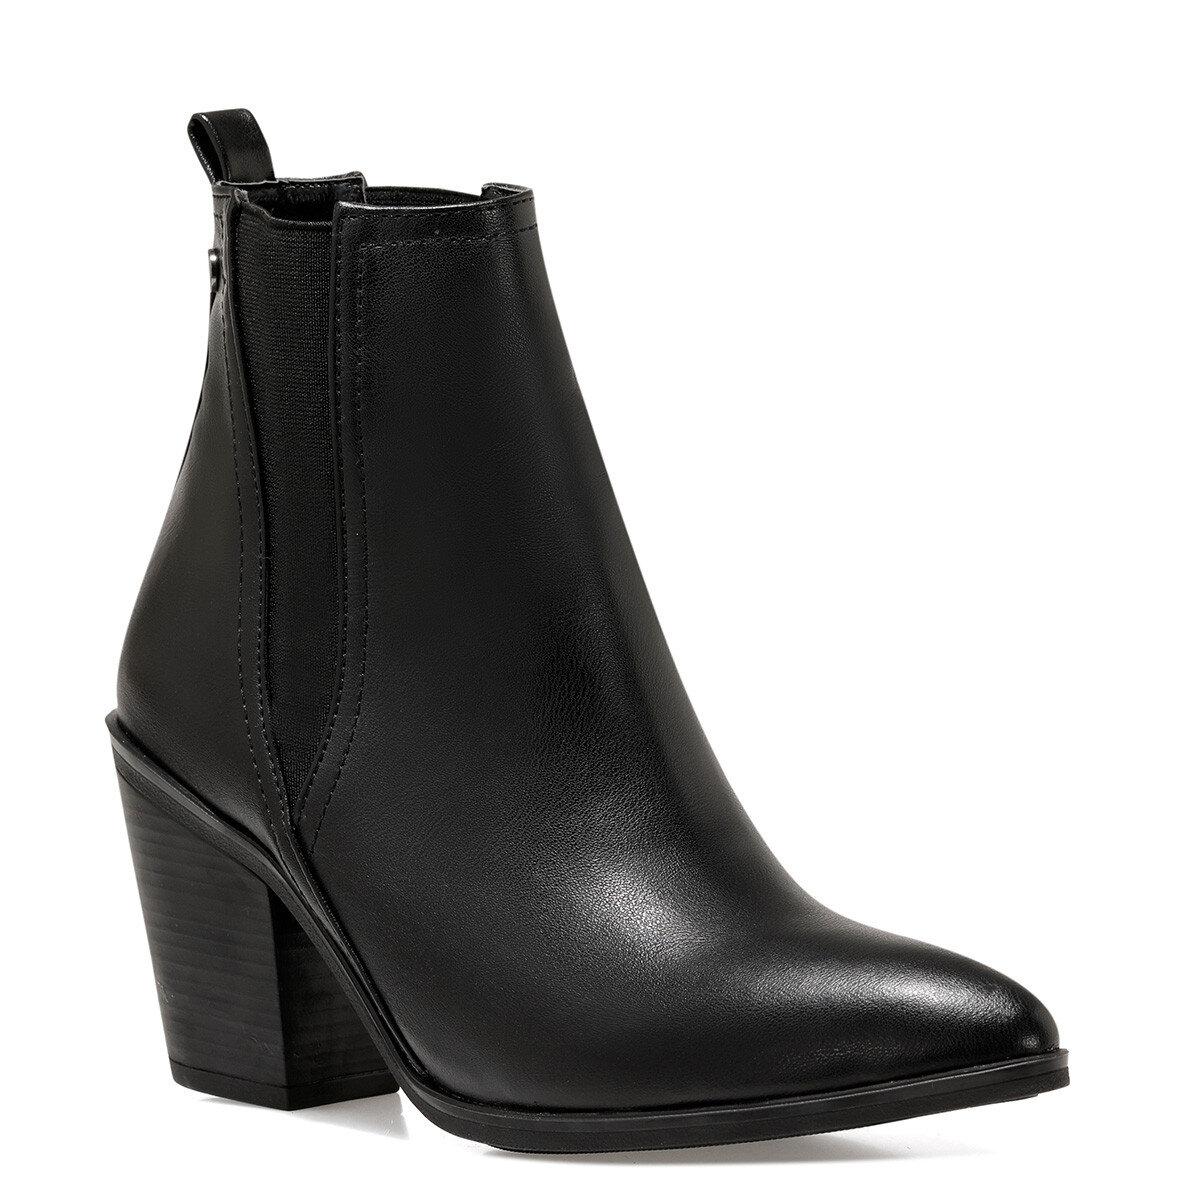 BARGEN2 Siyah Kadın Topuklu Bot